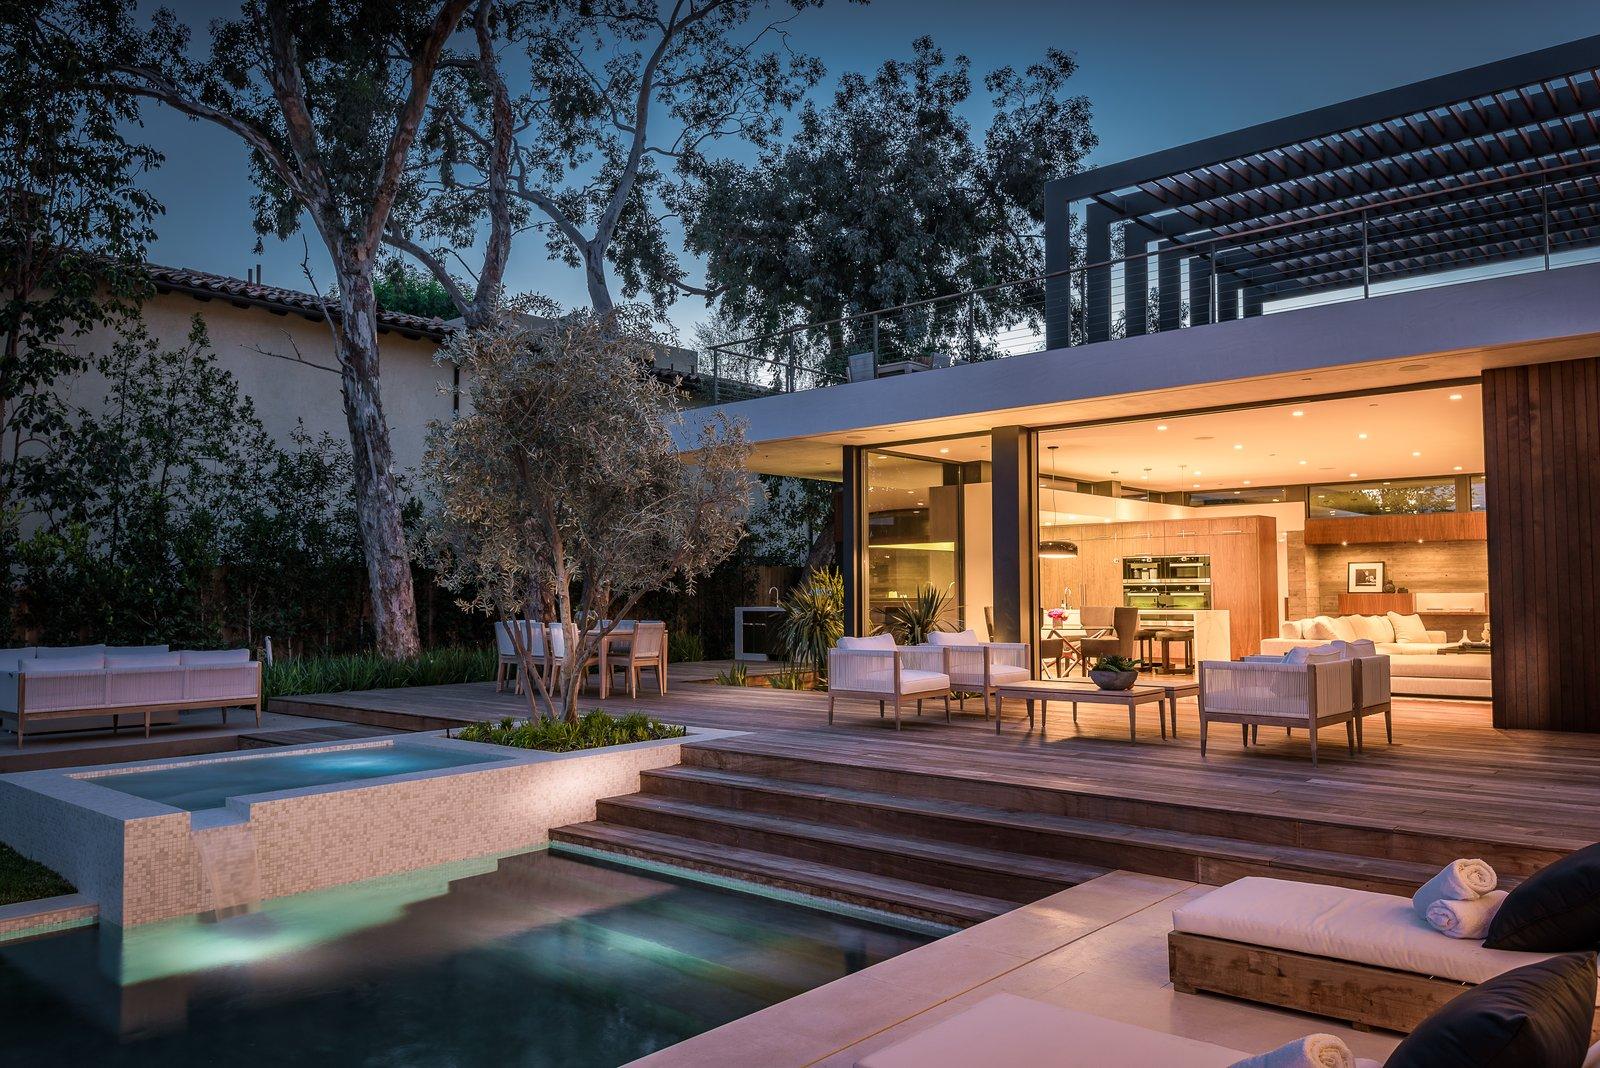 Pool Terrace  Amalfi Drive Residence by Daryl Olesinski